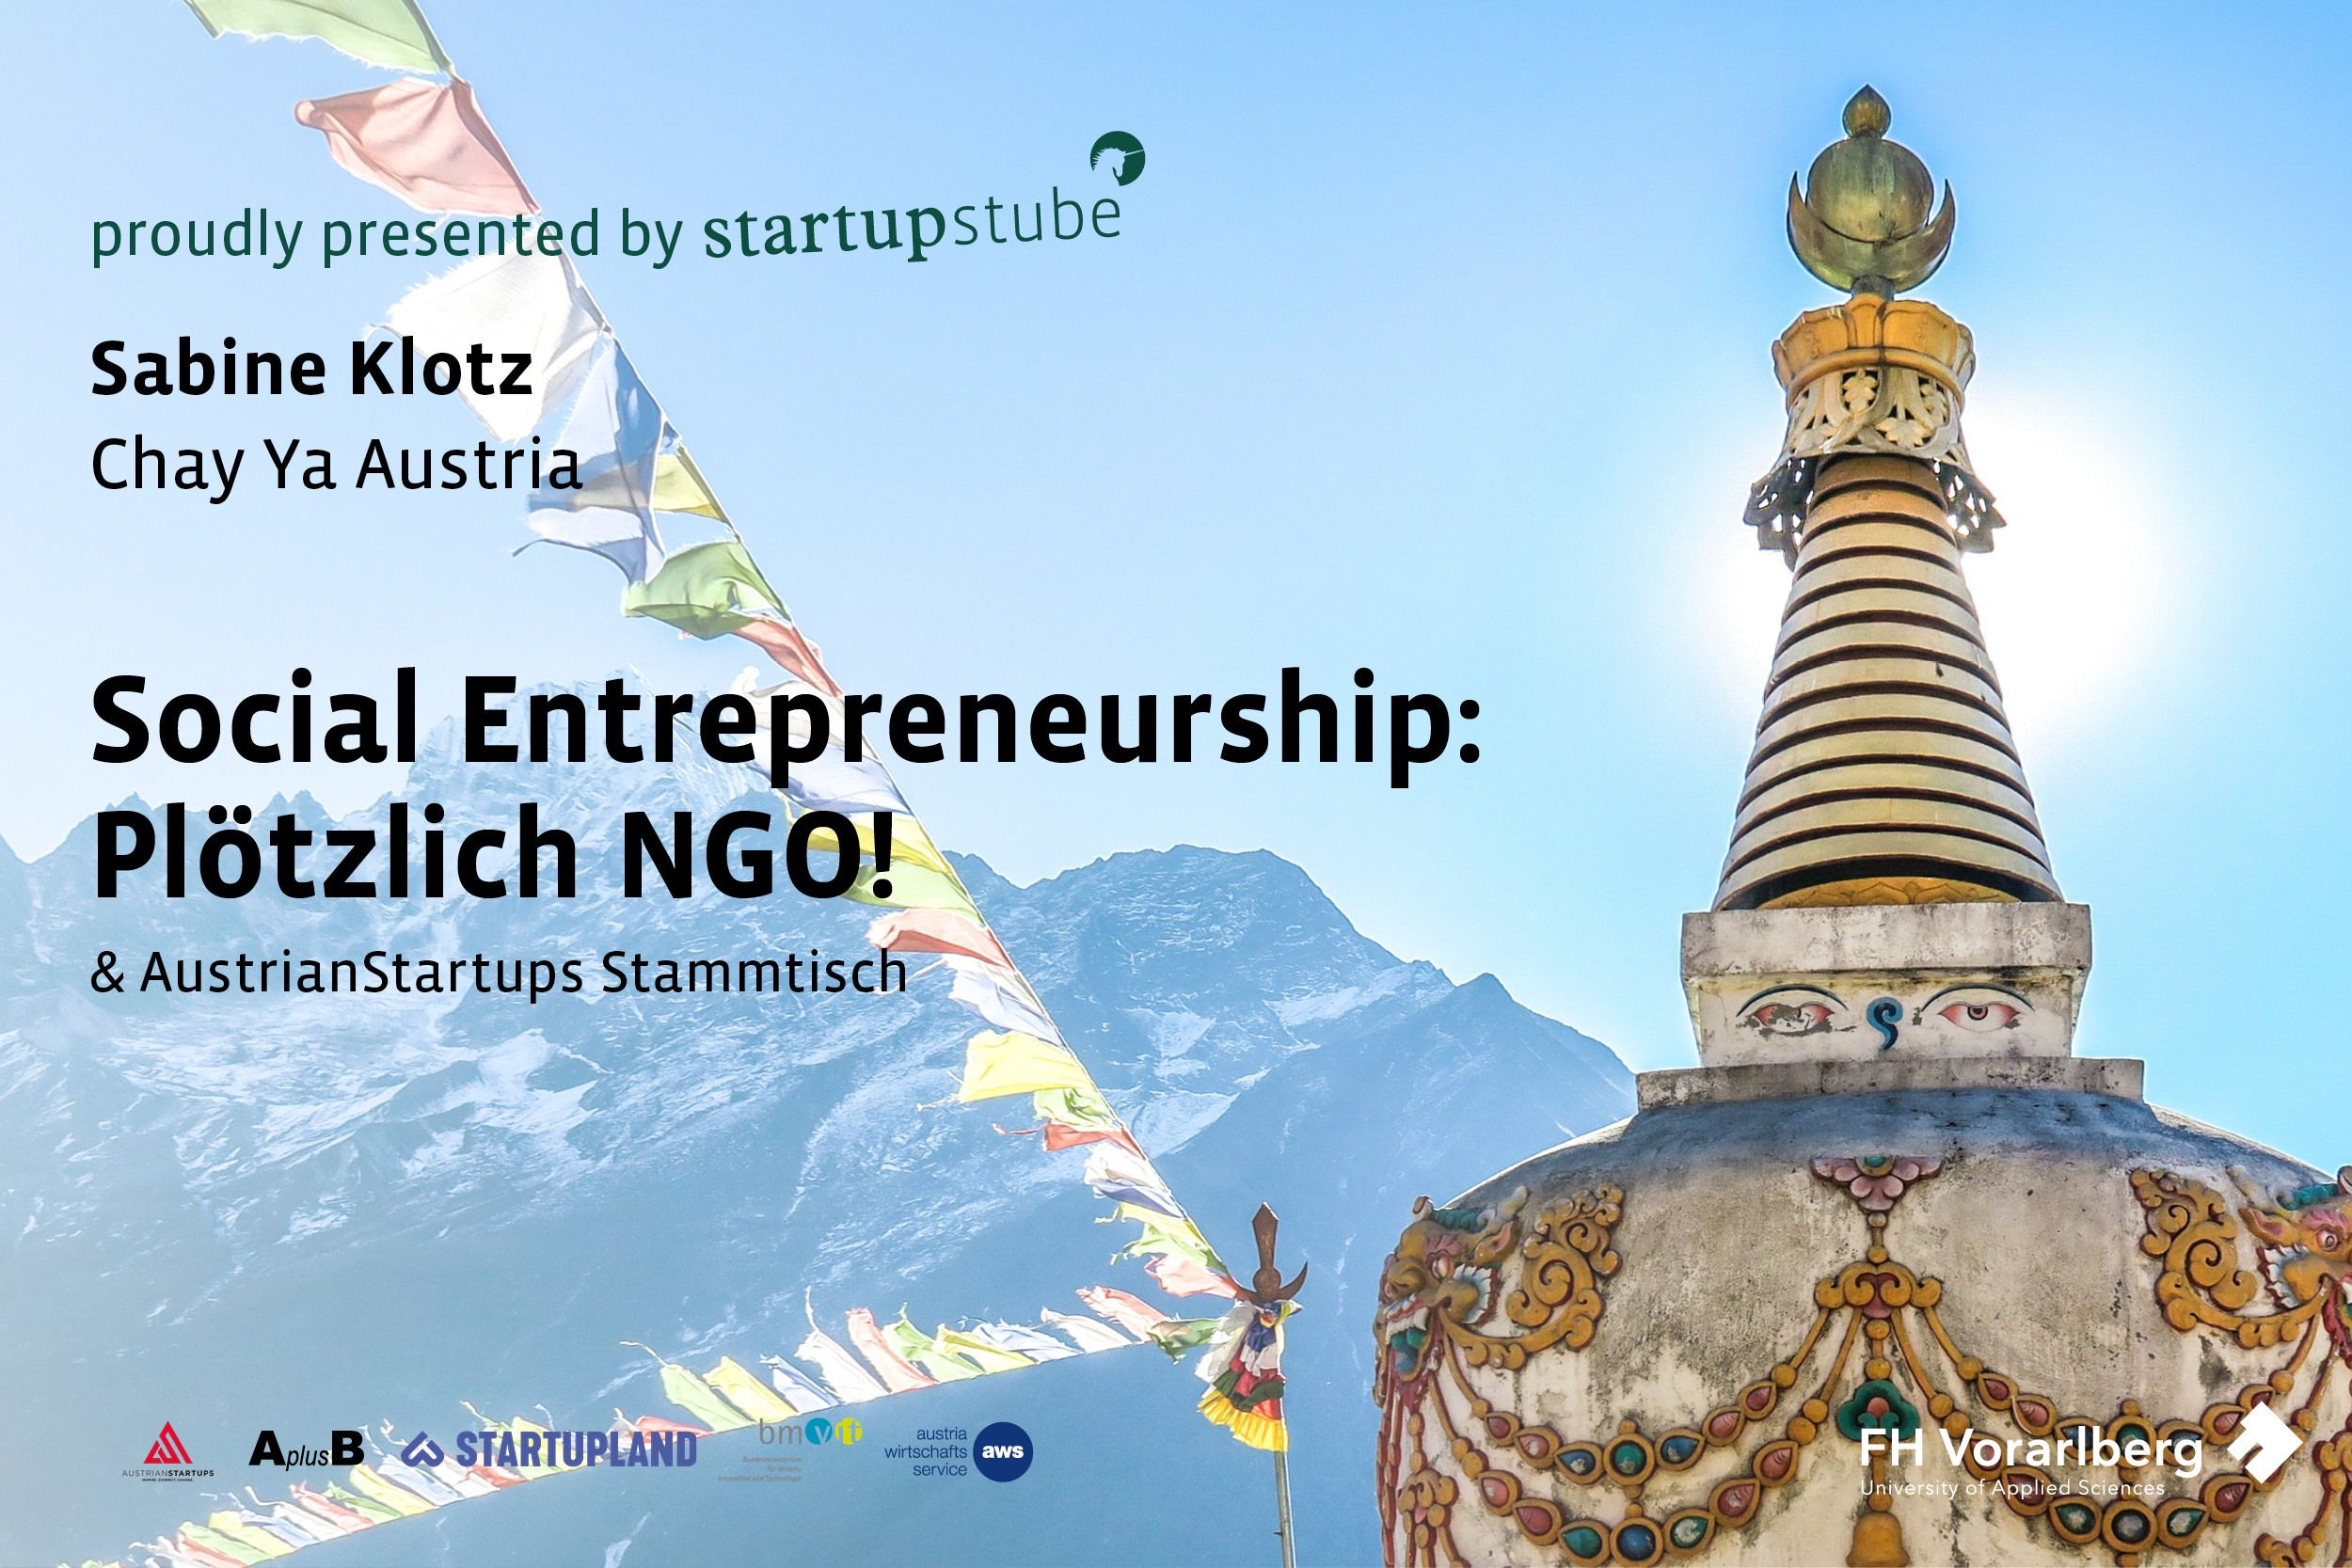 Social Entrepreneurship: Plötzlich NGO!